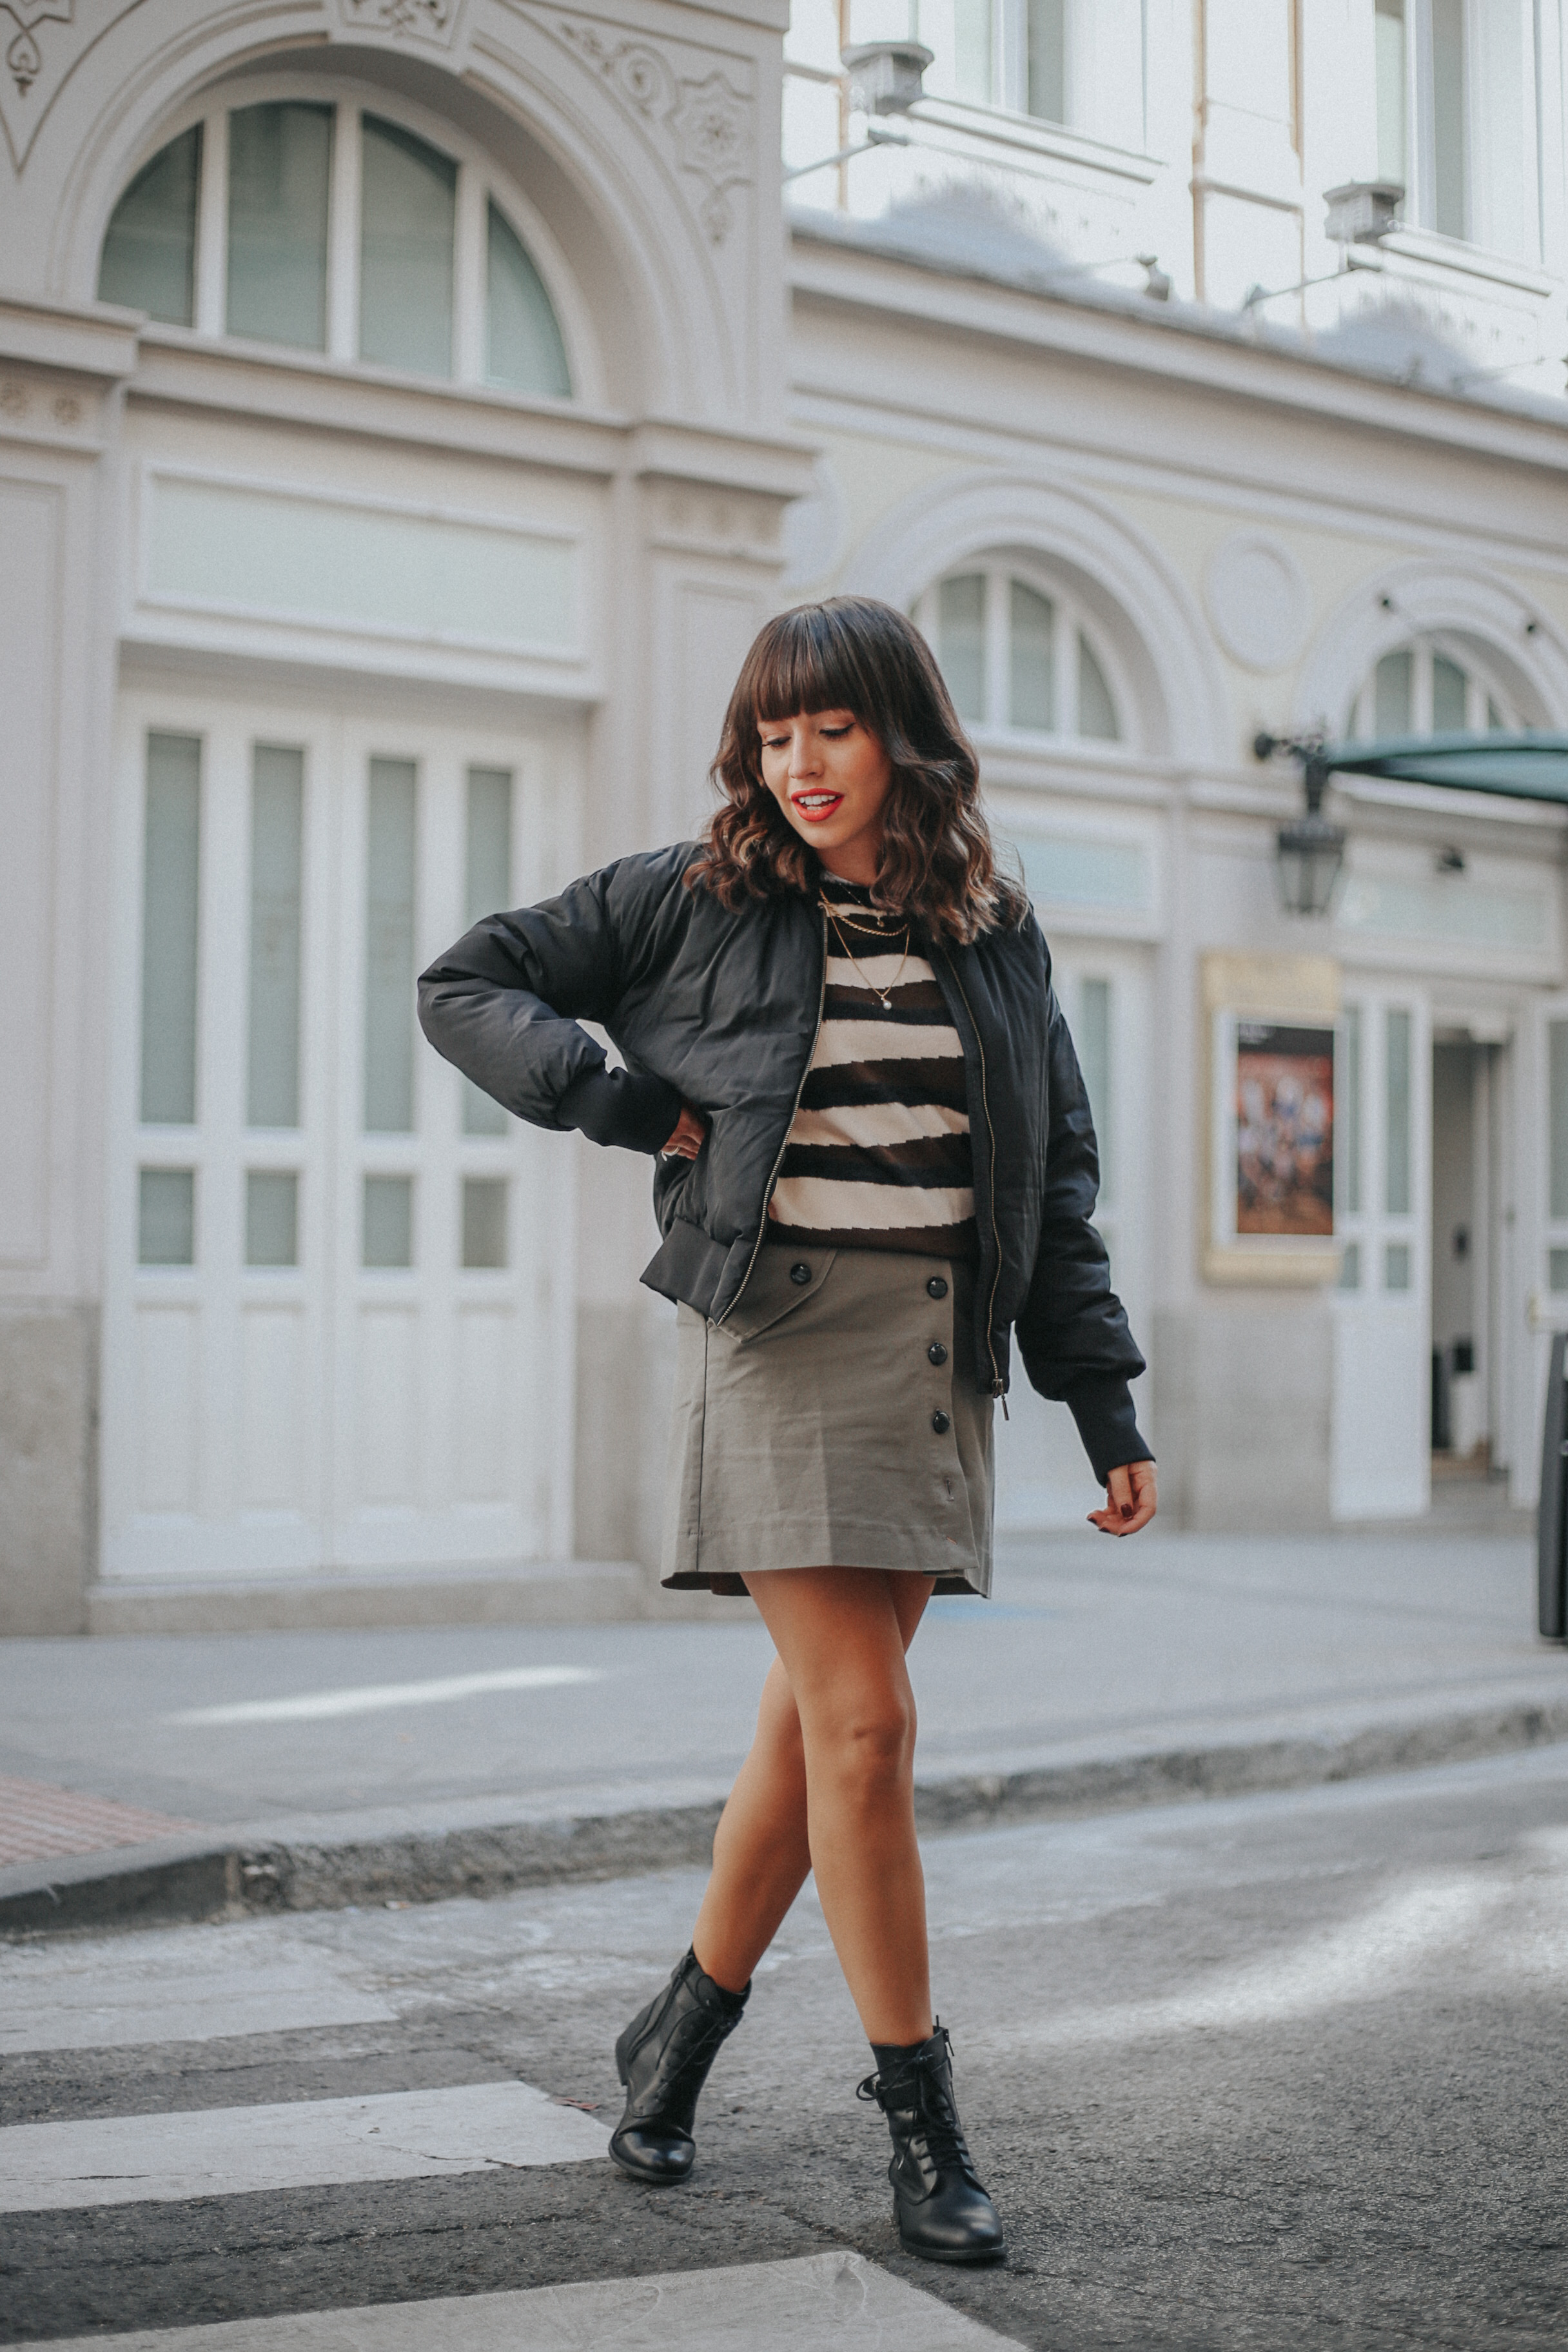 La Redoute, Otoño invierno, abrigo acolchado, animal print